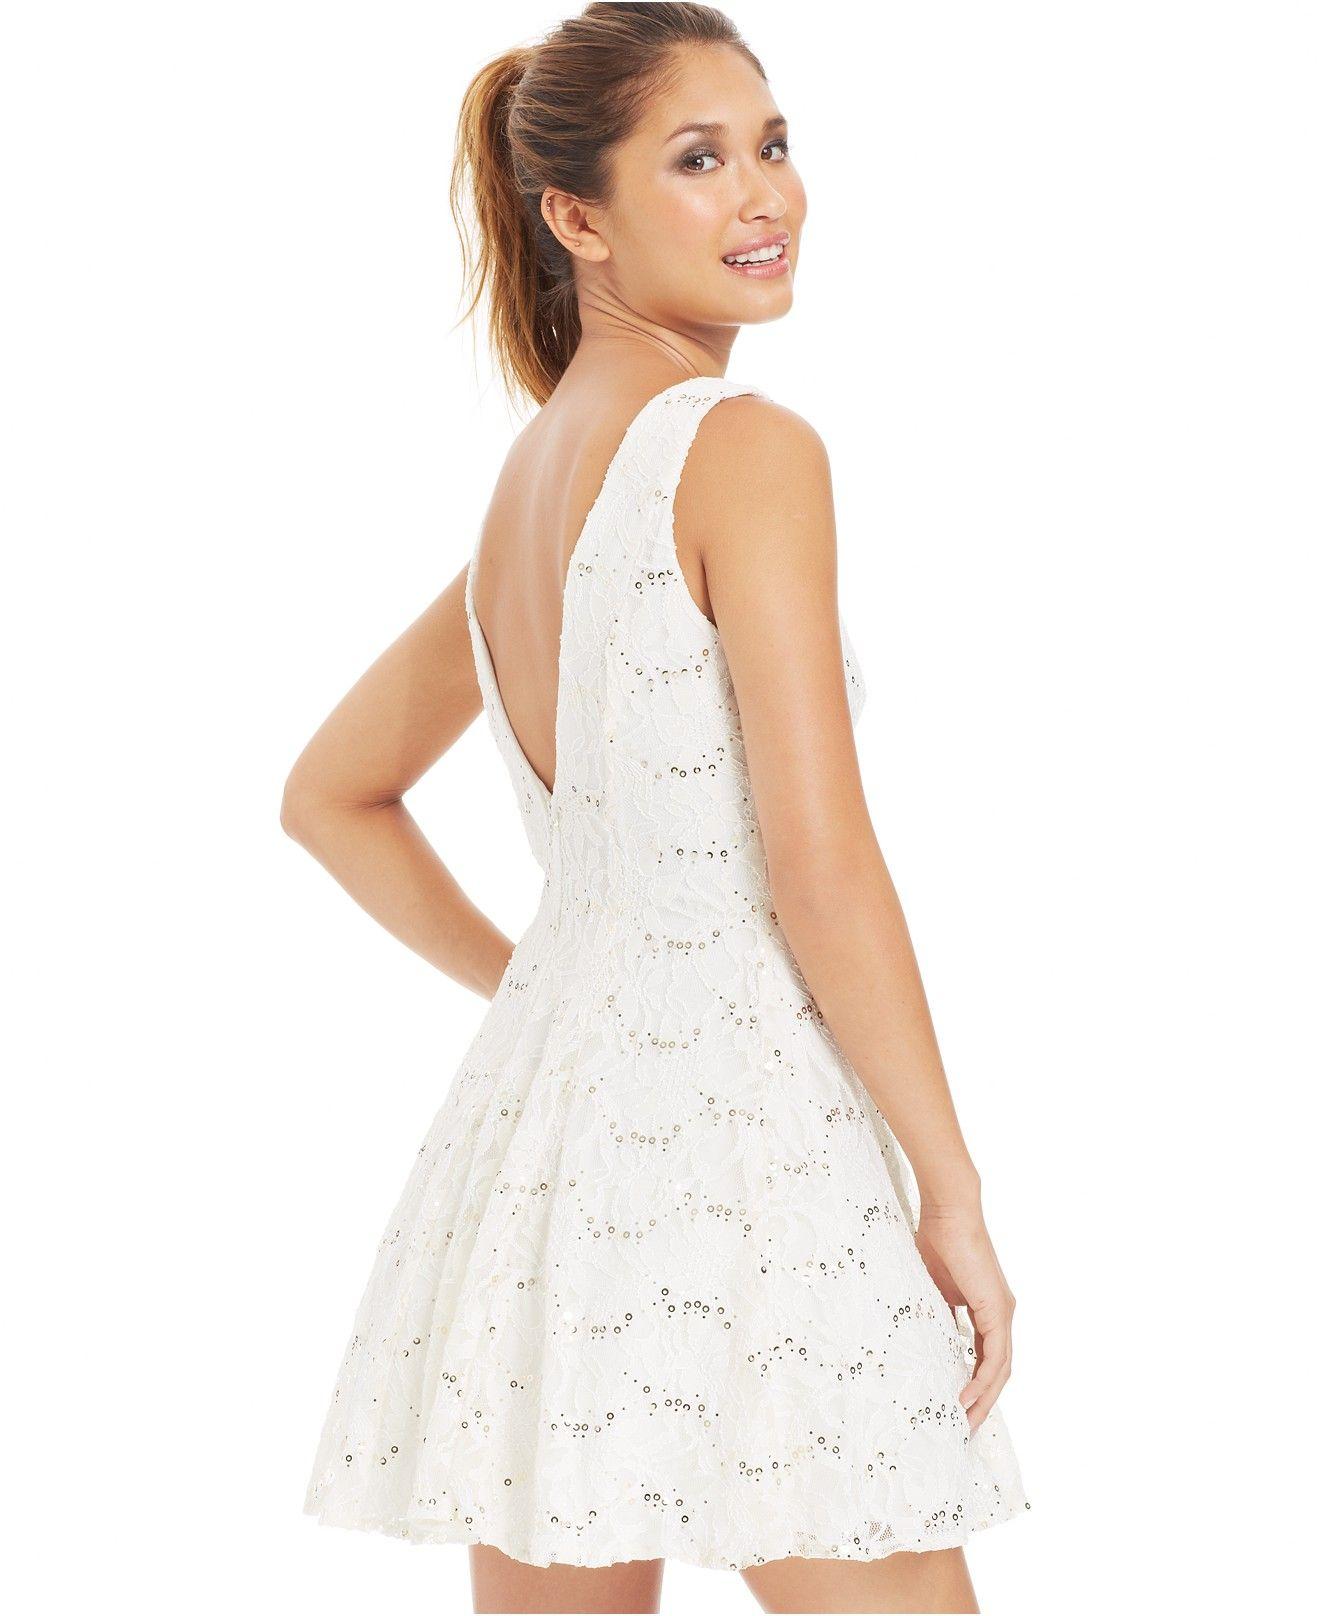 01f892cc248f3 B Darlin Juniors' Sequin Lace Dress - Juniors Dresses - Macy's ...